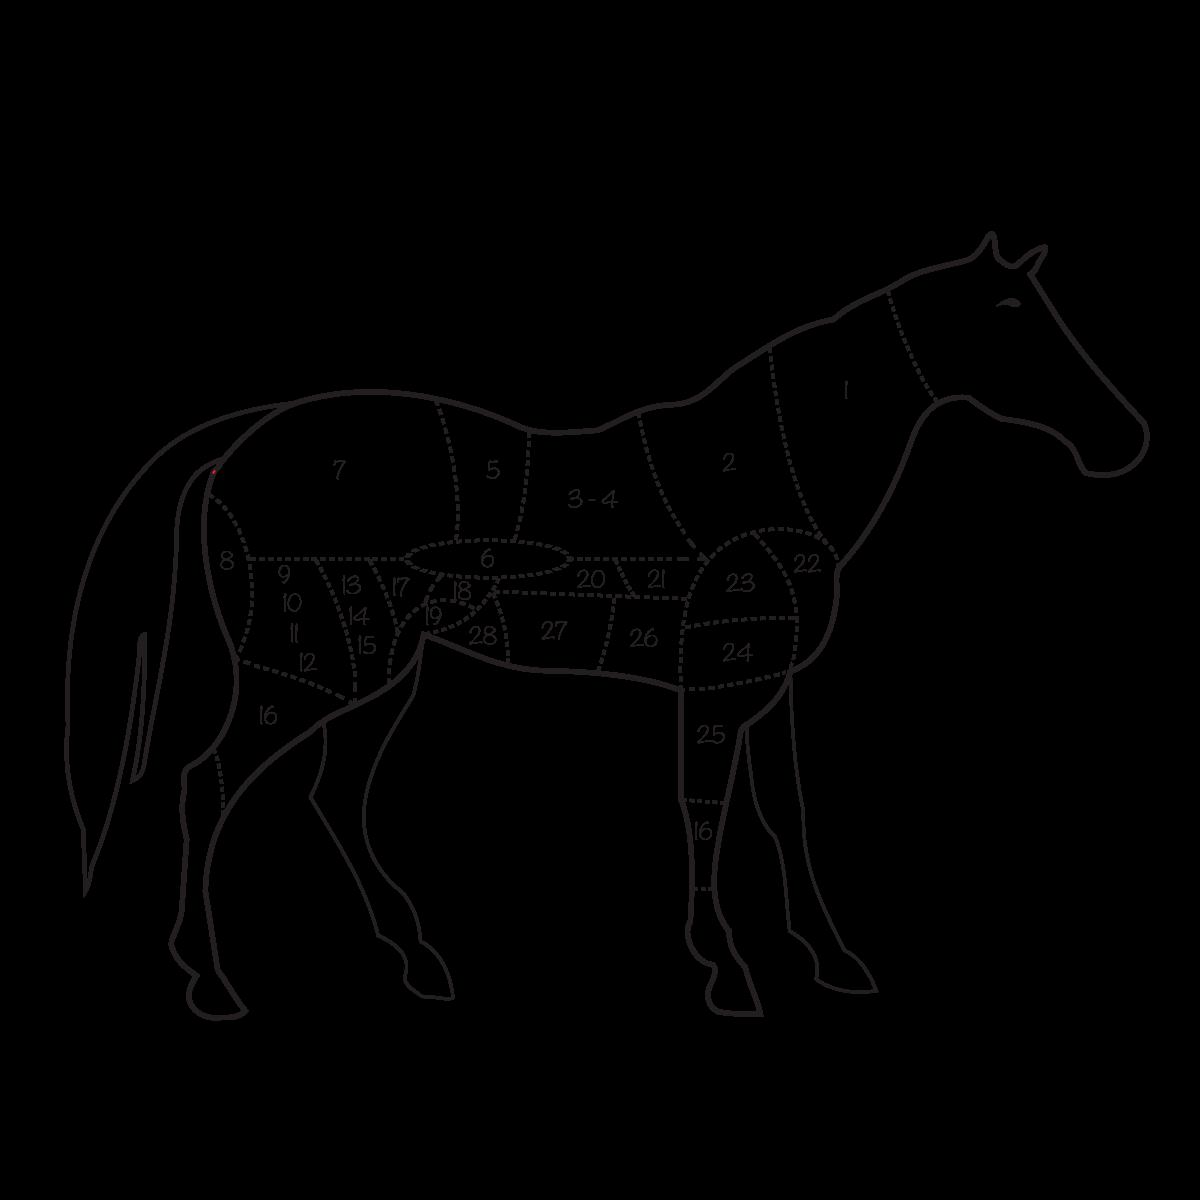 pieces-viande-de-cheval-schema-decoupe-boucherie-chevaline